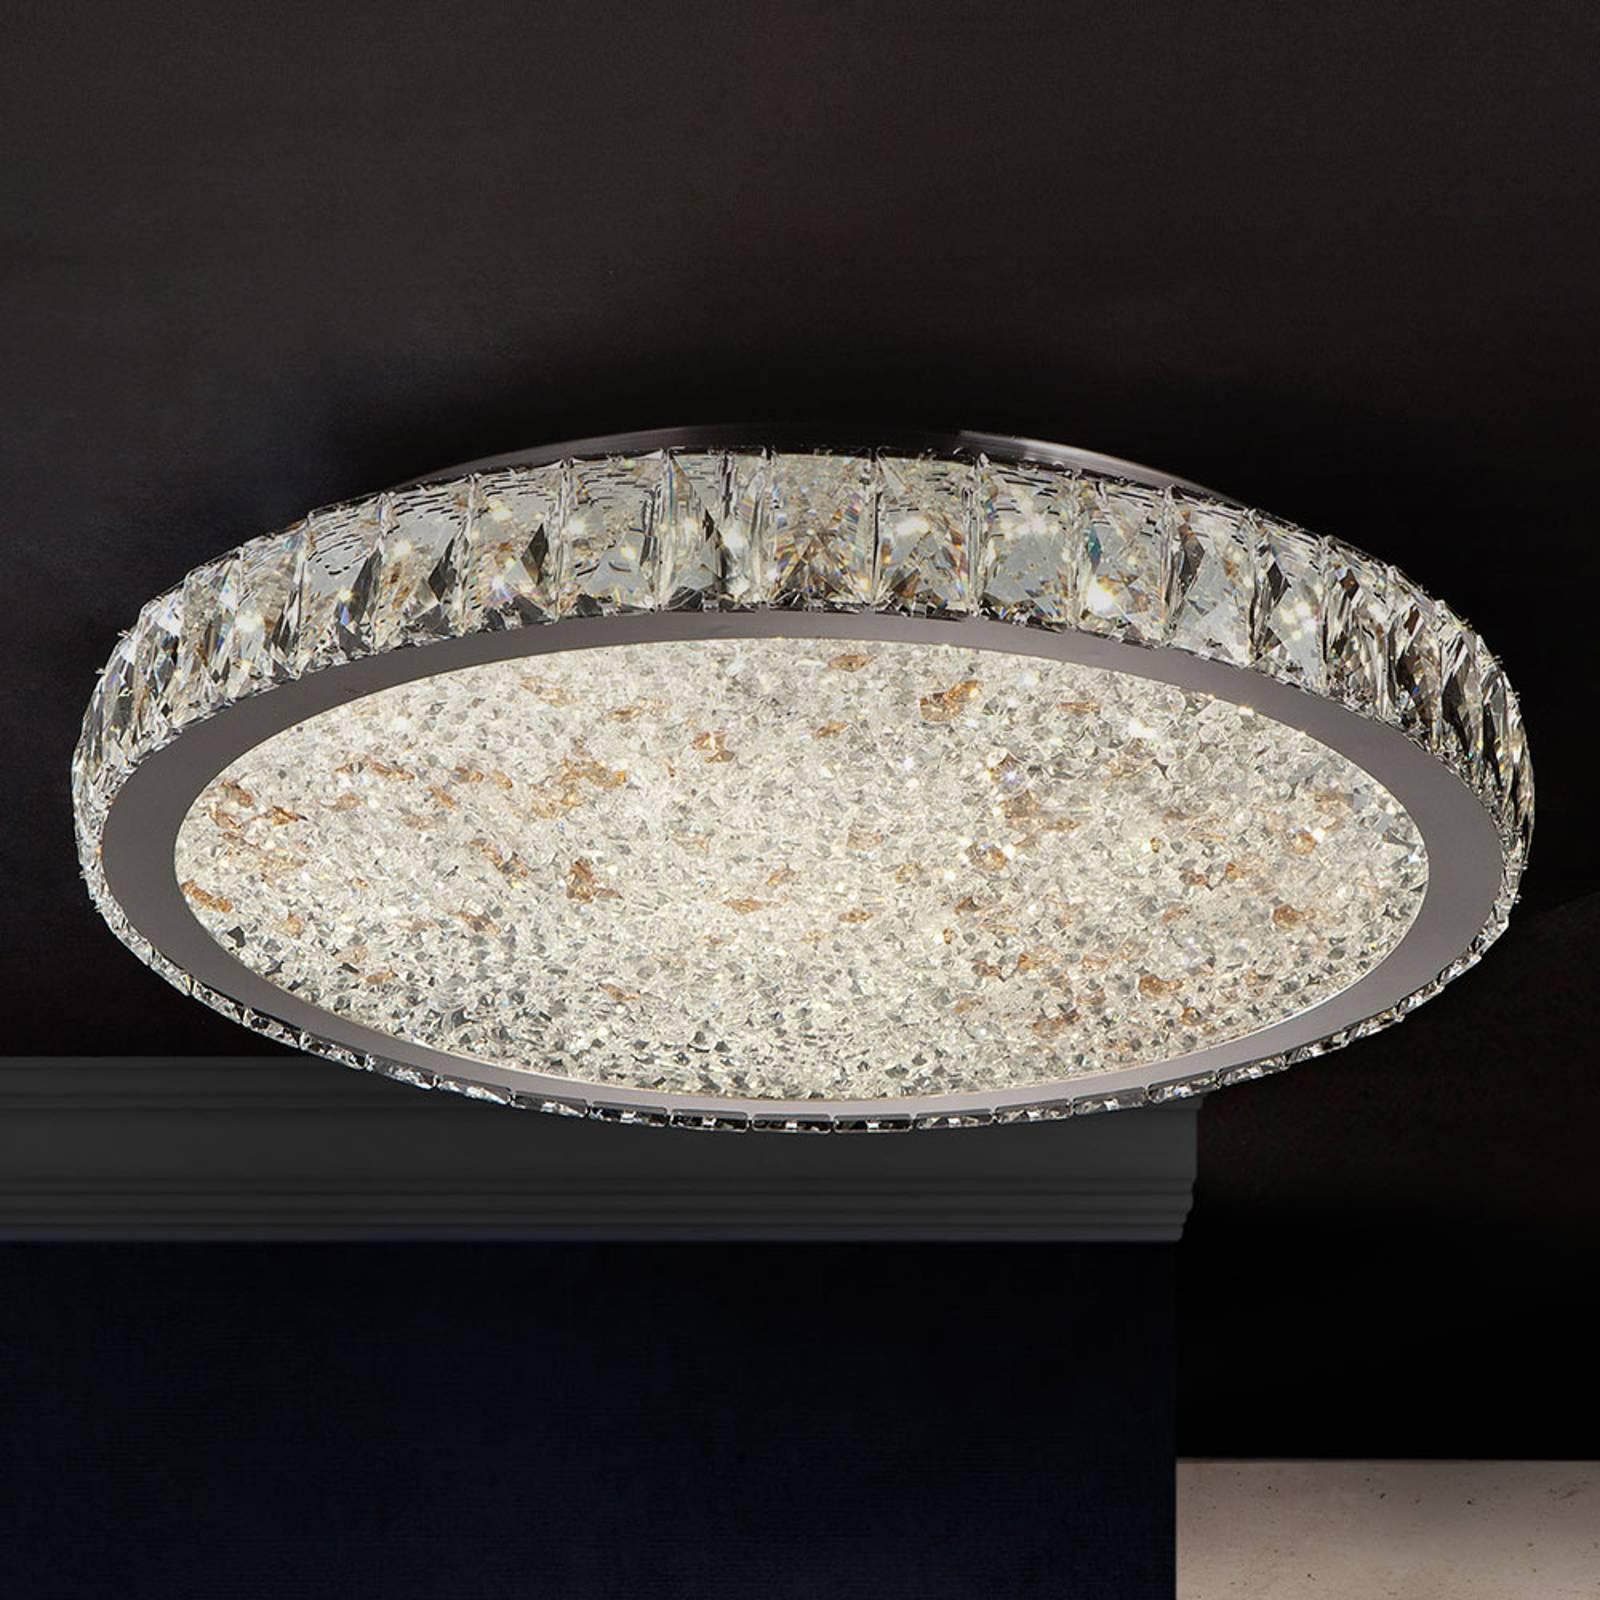 LED-kattovalaisin Dana, kristalleja, Ø 49 cm